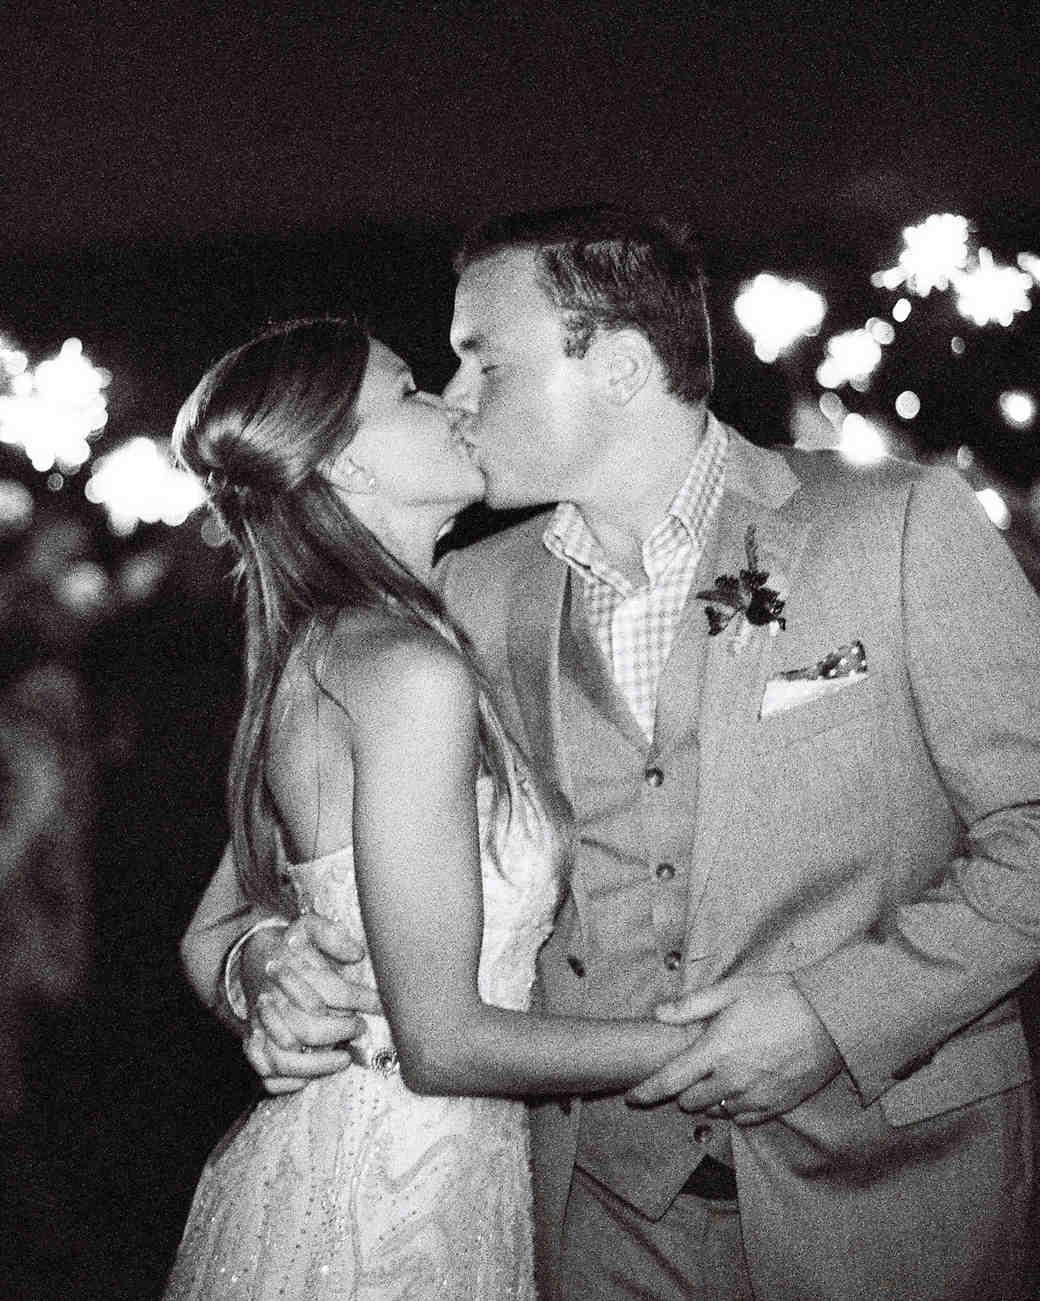 erin-jj-wedding-sparklers-99-s111742-0115.jpg